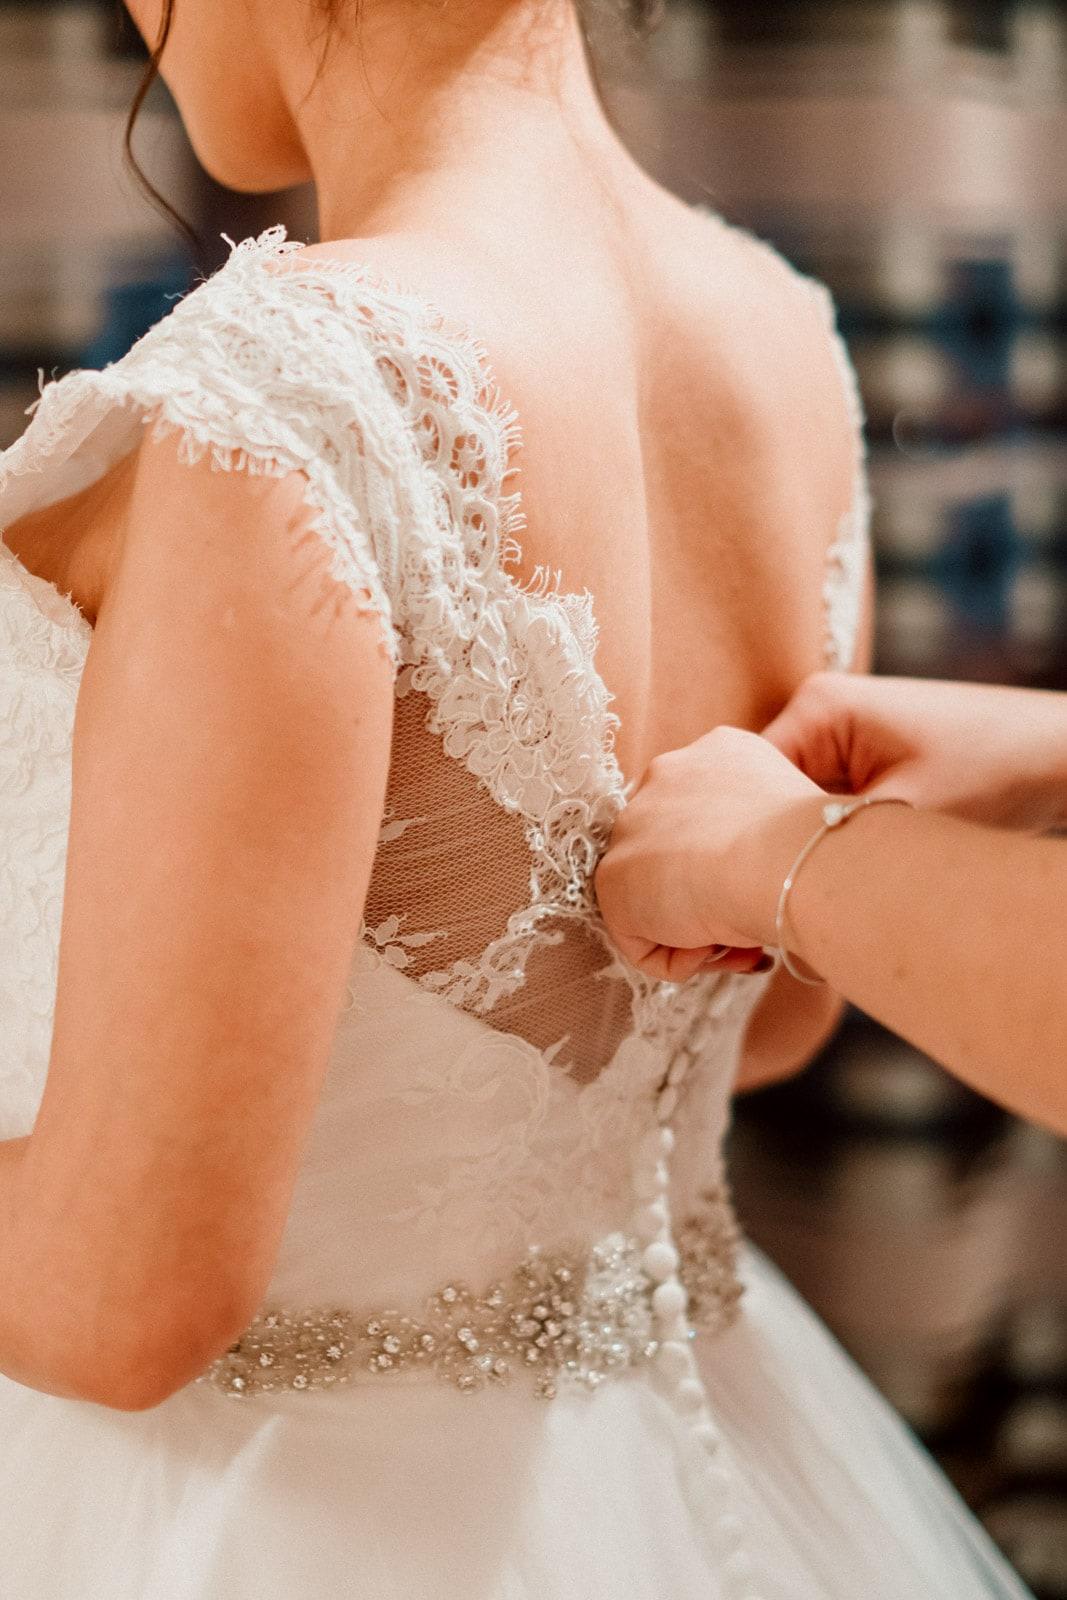 Oran-Mor-Wedding-Photographer-DearlyPhotography (7 of 55).jpg